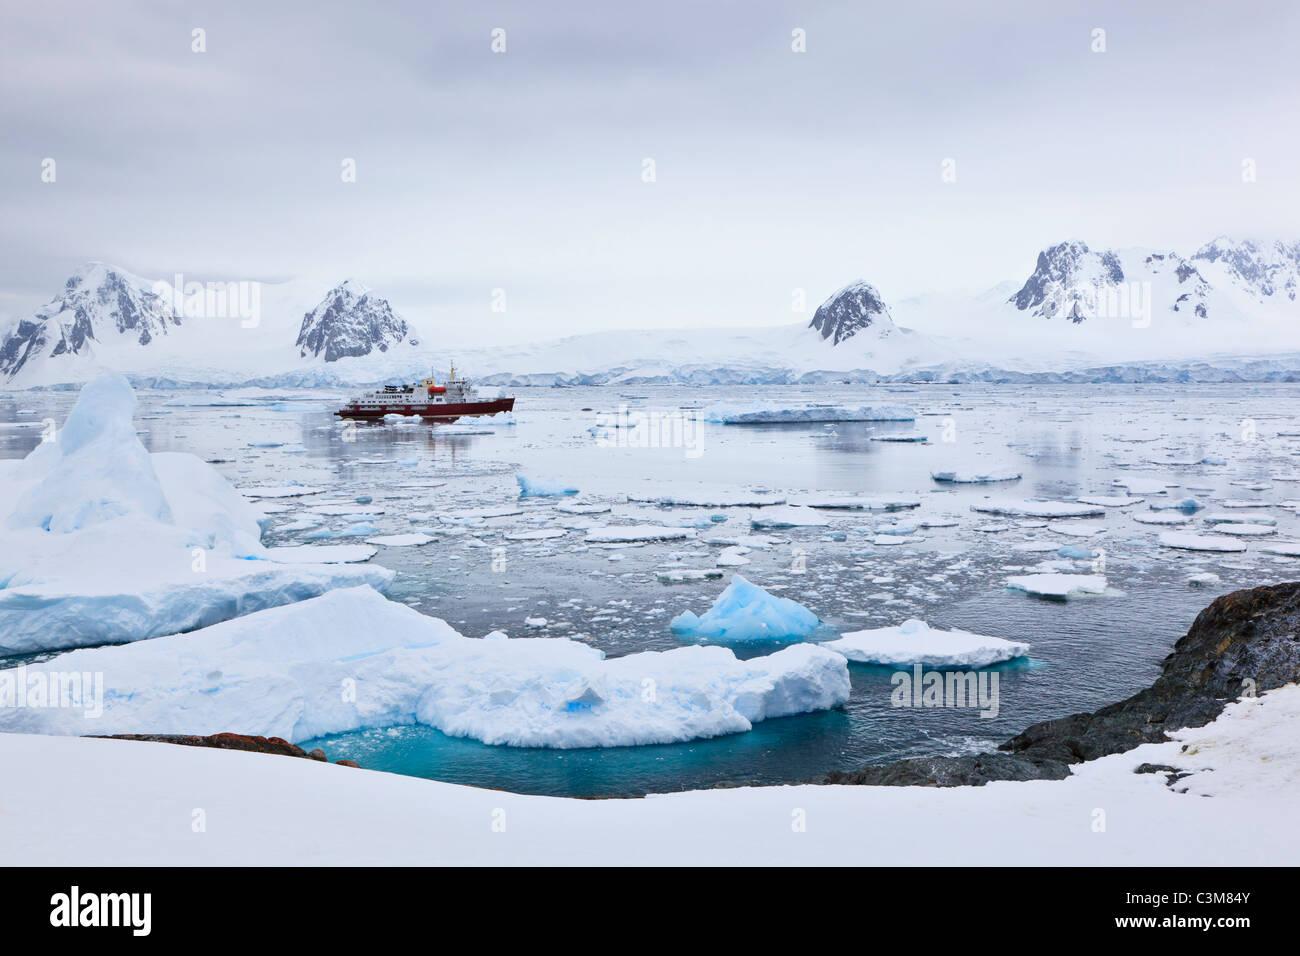 South Atlantic Ocean, Antarctica, Antarctic Peninsula, Lemaire Channel, Yalour Islands, Polar Star icebreaker cruise - Stock Image